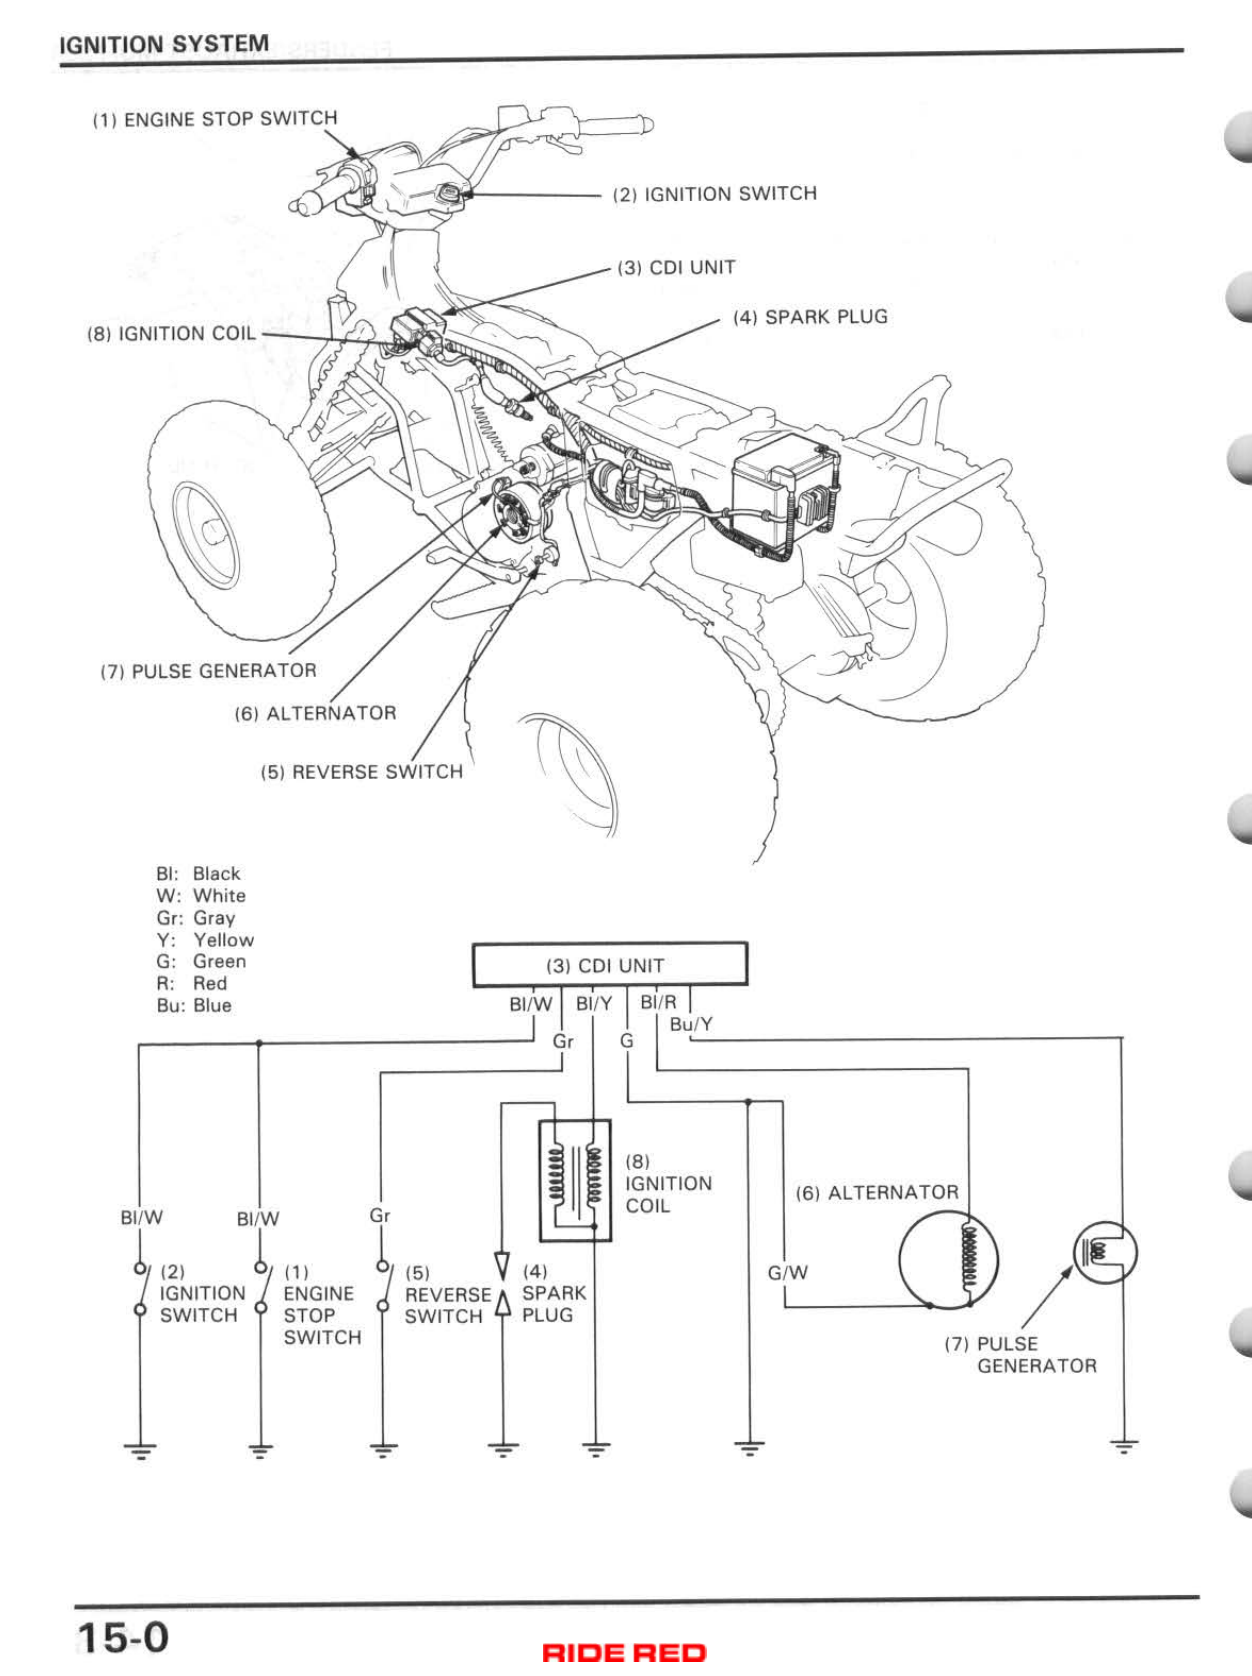 Honda Trx200sx Wiring Diagram Library. Wiring Diagram Contemporary 1987 Honda Trx200sx 1988 Click For Larger Version Name Ignsystem Views 29 Size. Honda. Honda 200sx Wiring Diagram At Scoala.co